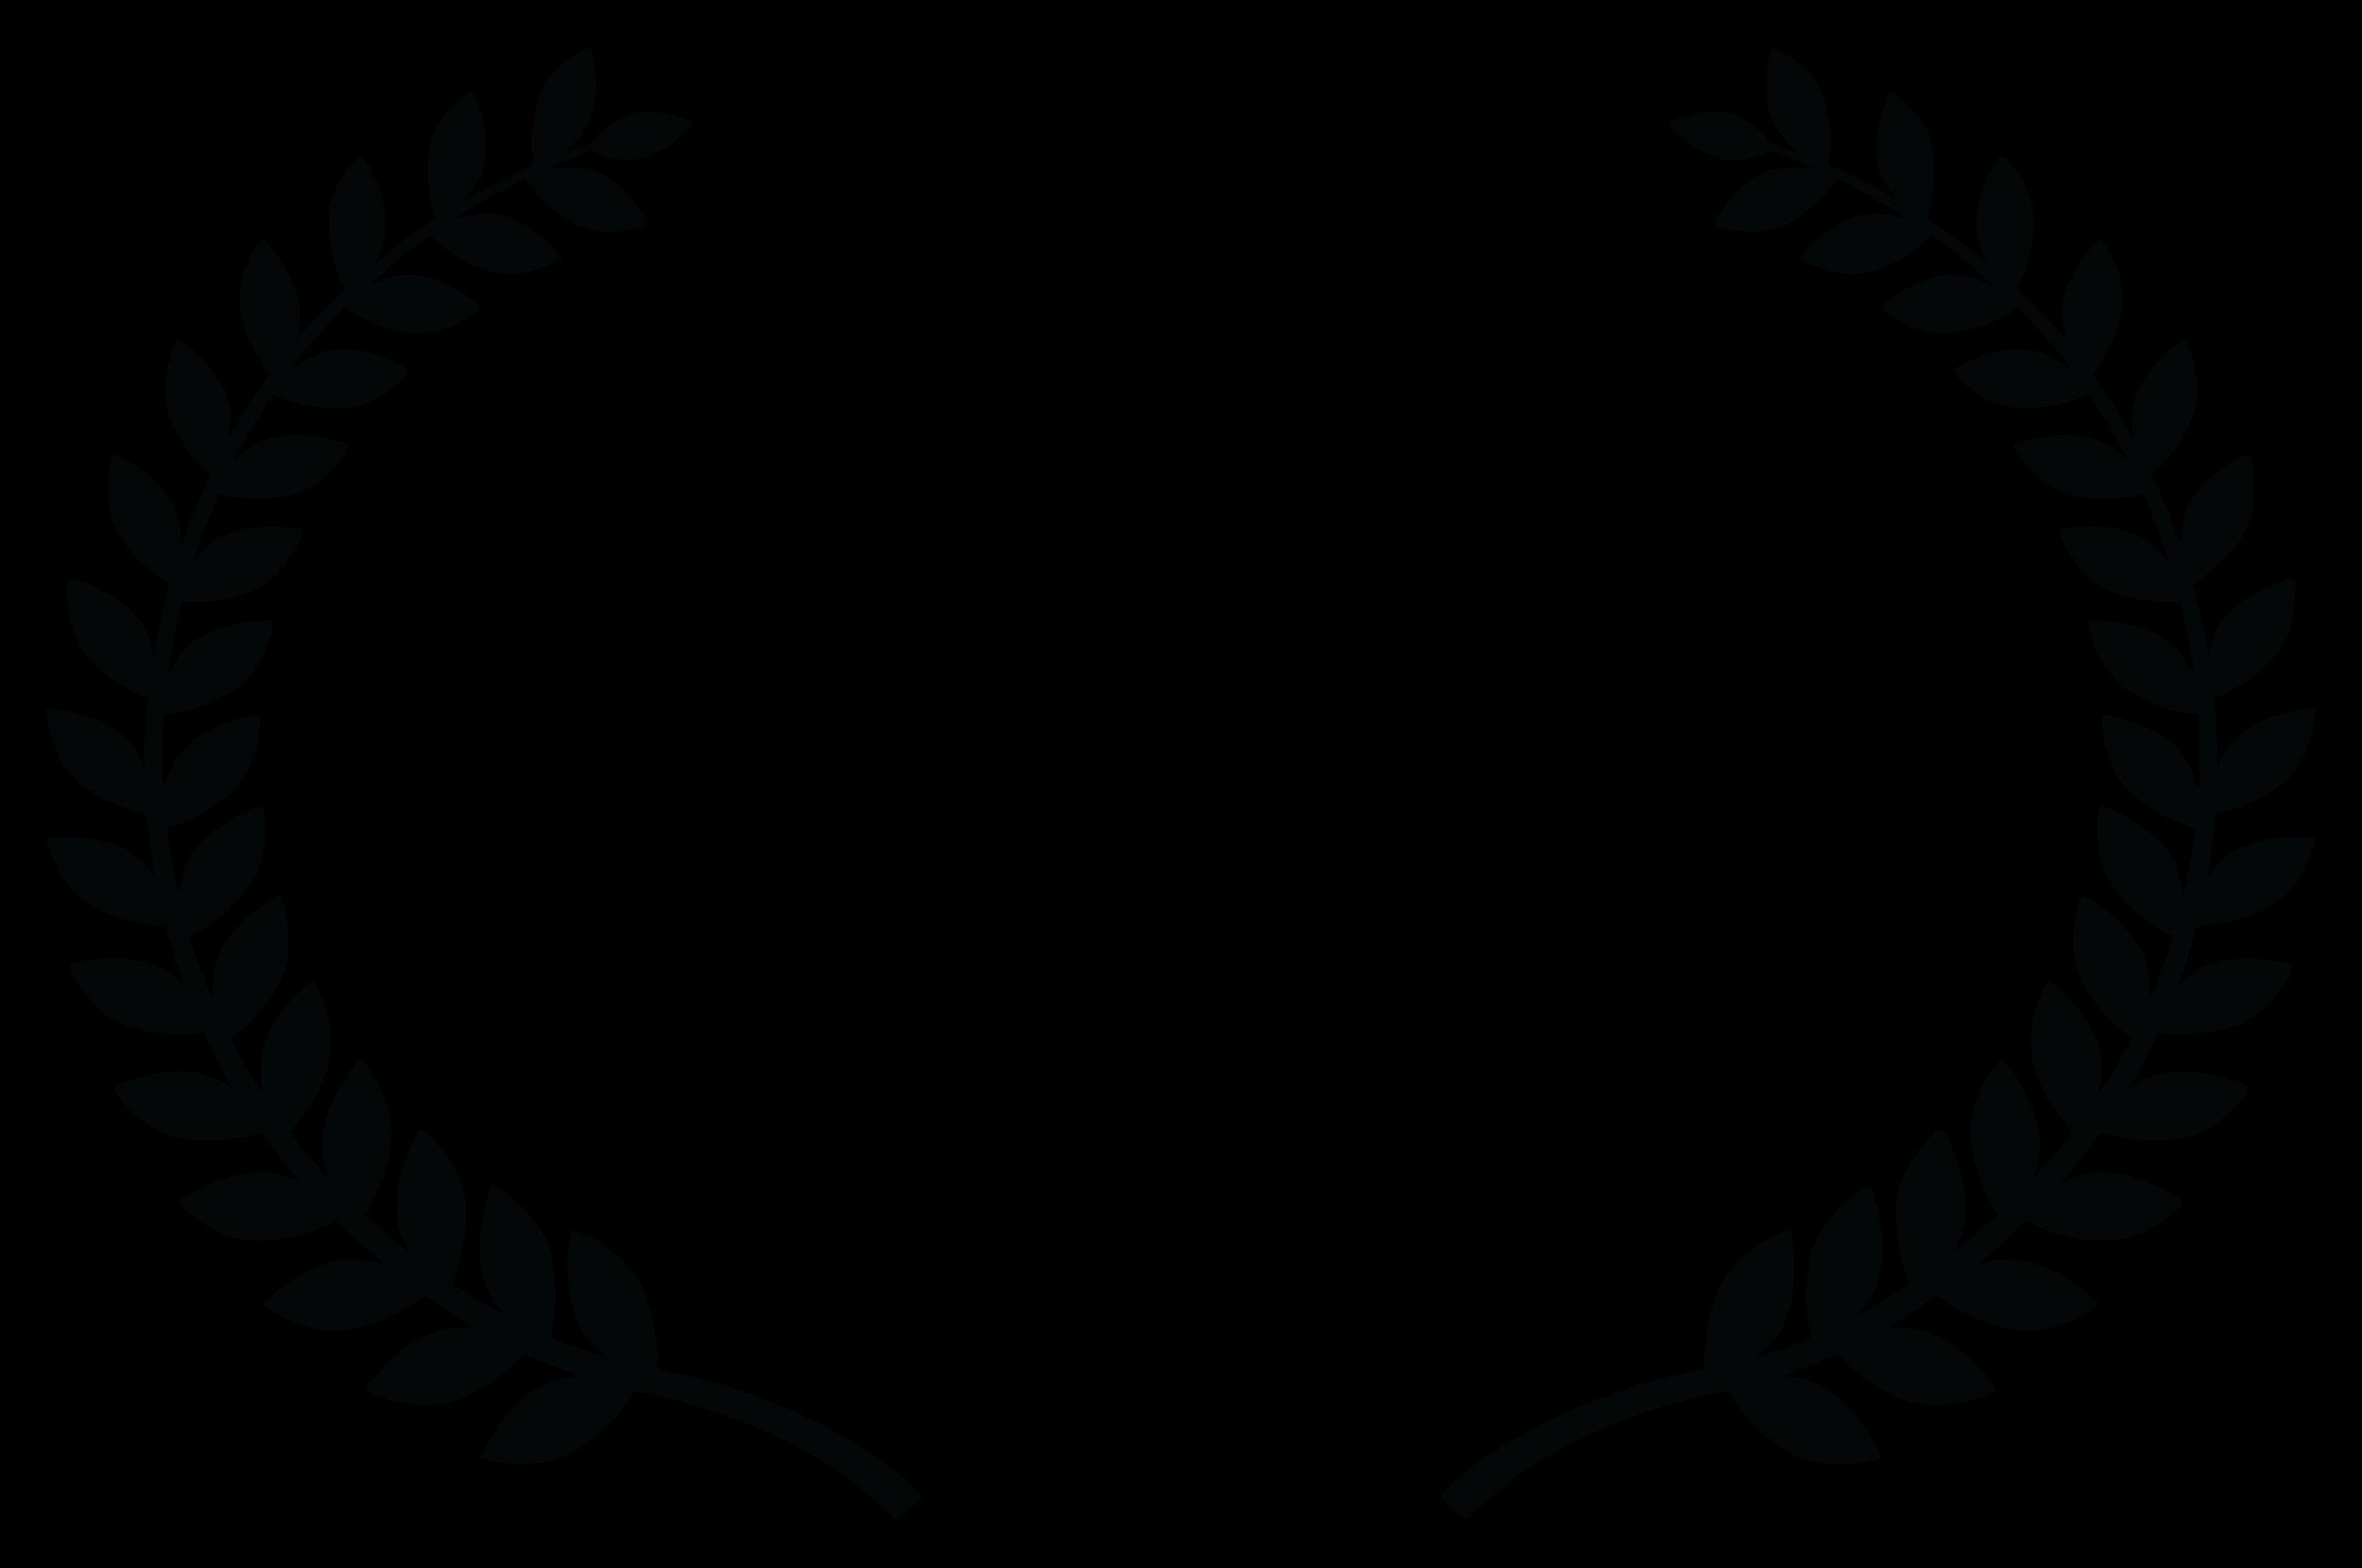 OFFICIALSELECTION-AmericanIndianFilmFestival-SanFrancisco2019.png